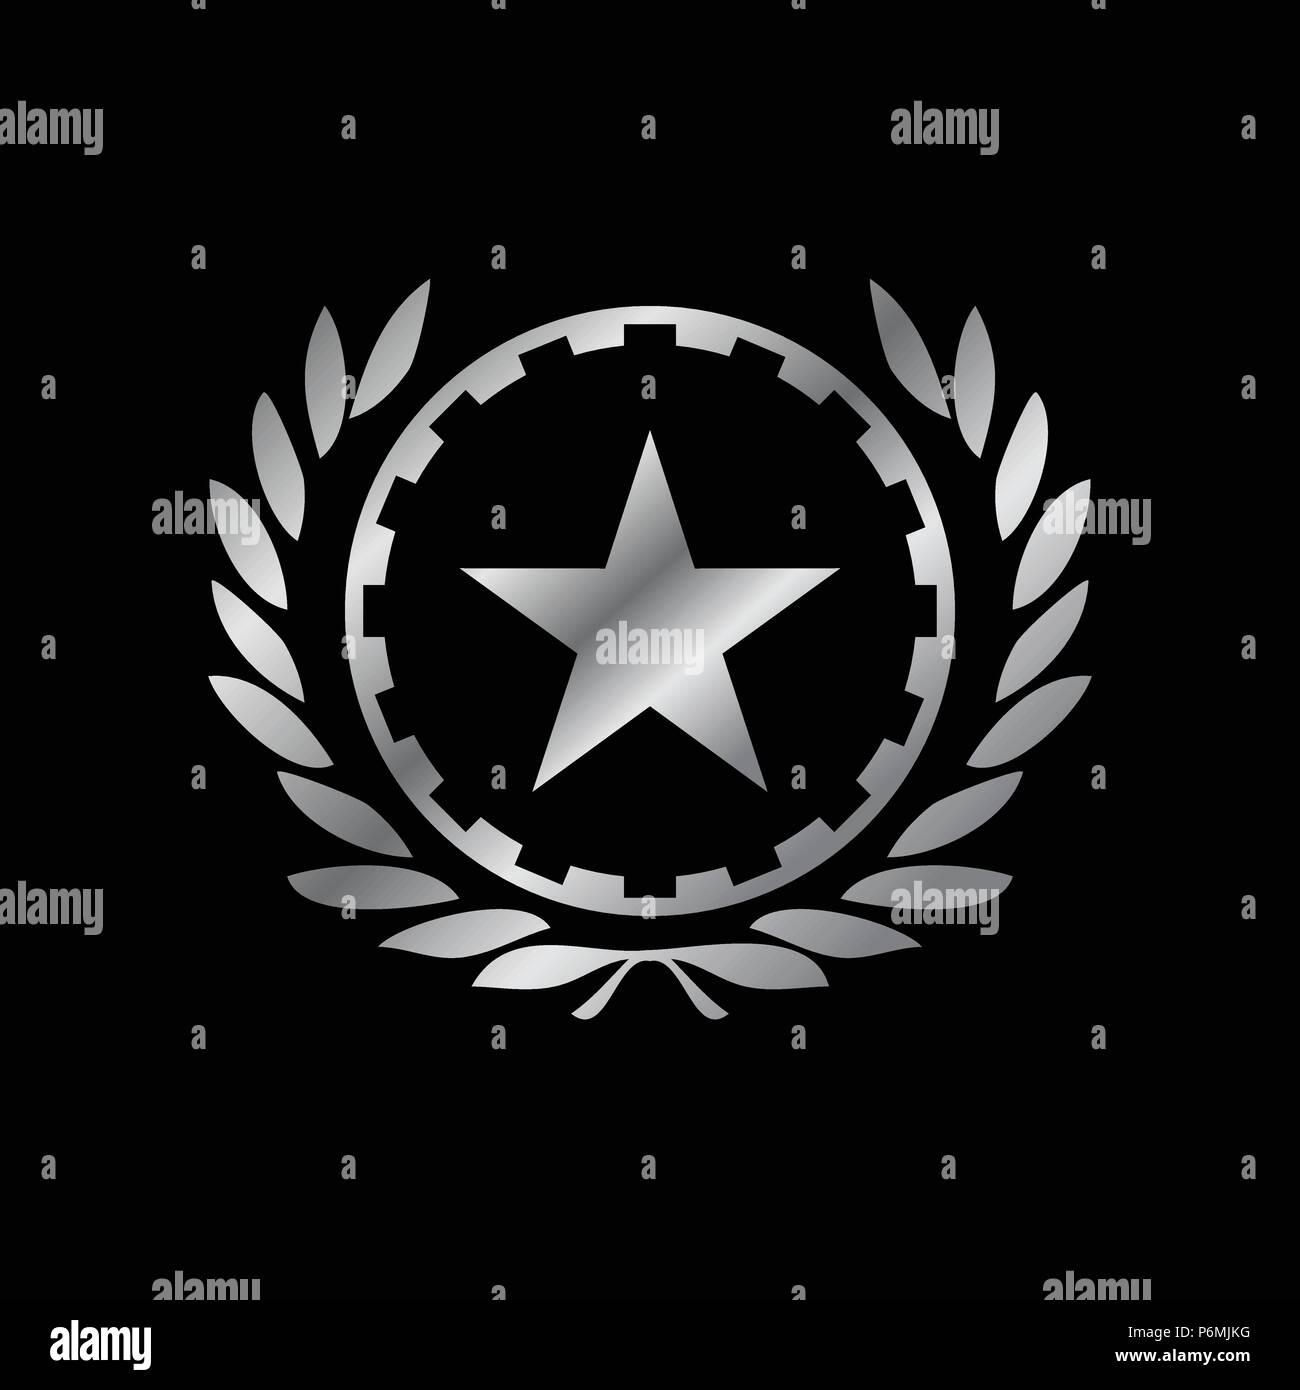 Silver Working Class Hero Emblem Vector Symbol Graphic Logo Design - Stock Vector